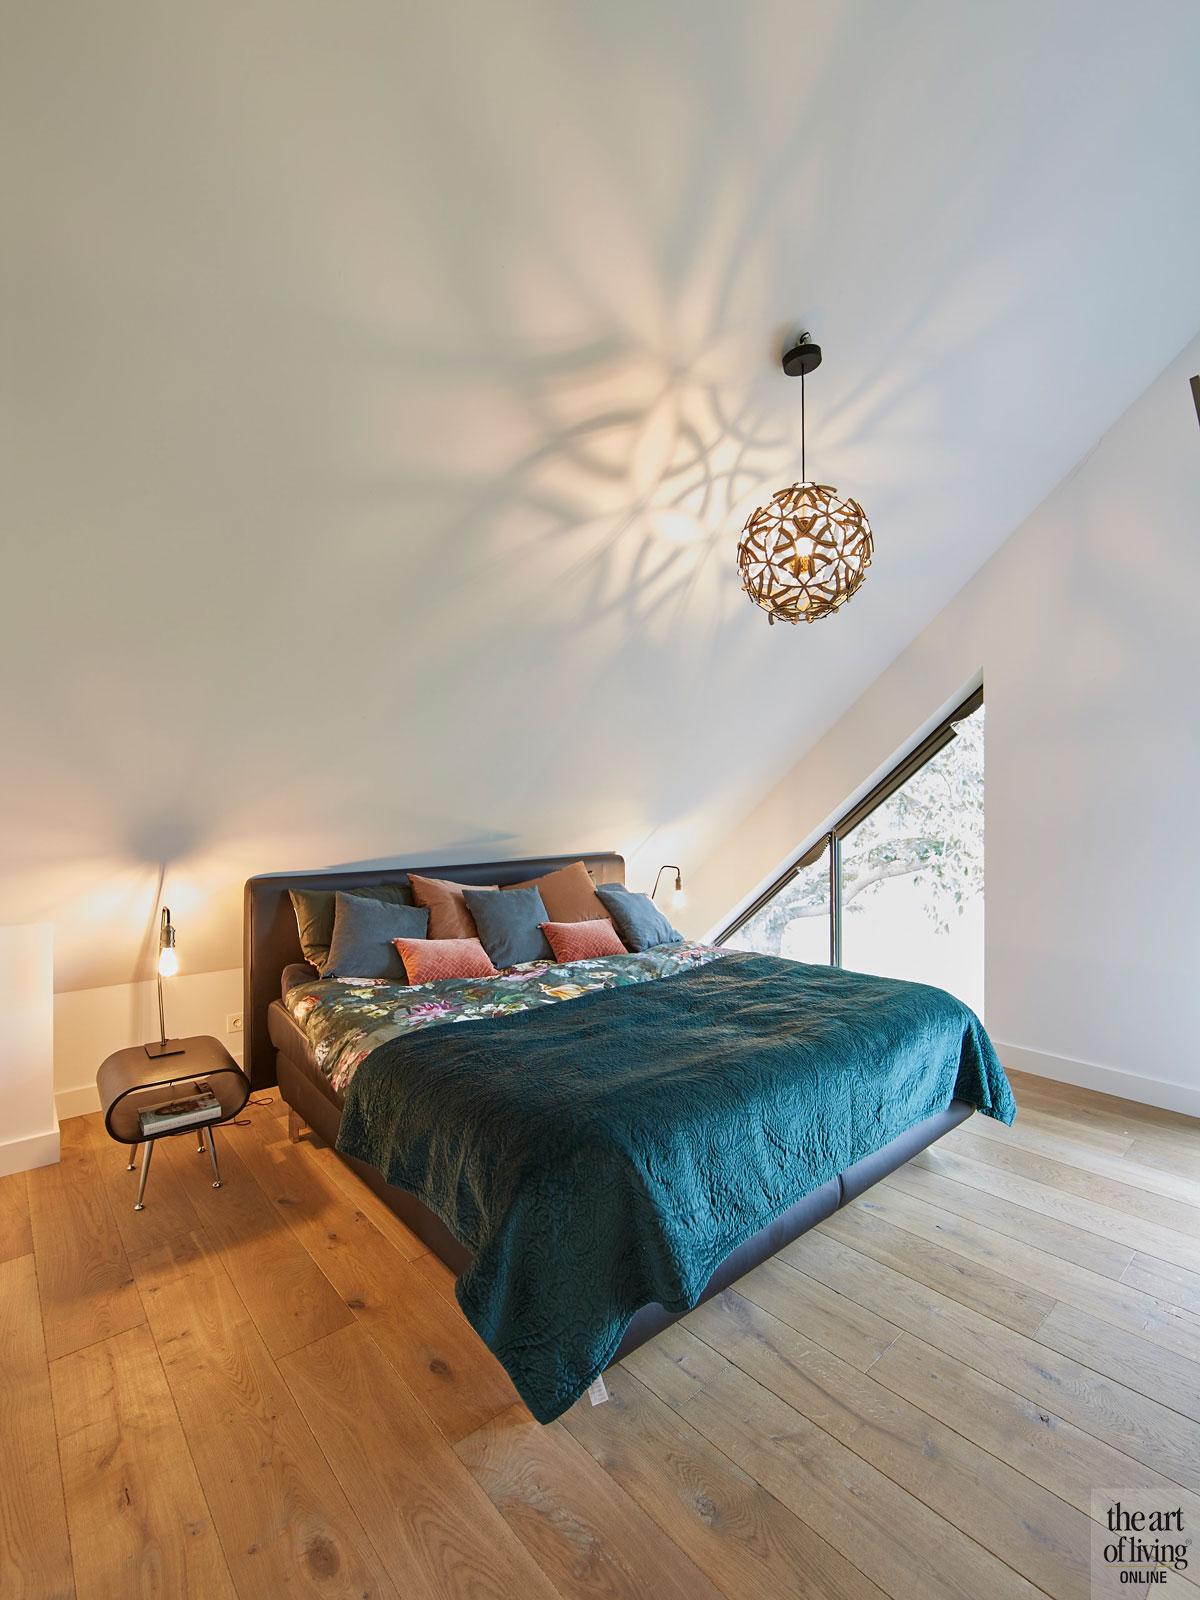 Chic interieur, Mirthe Janus, Slaapkamer, Masterbedroom, Houten vloer